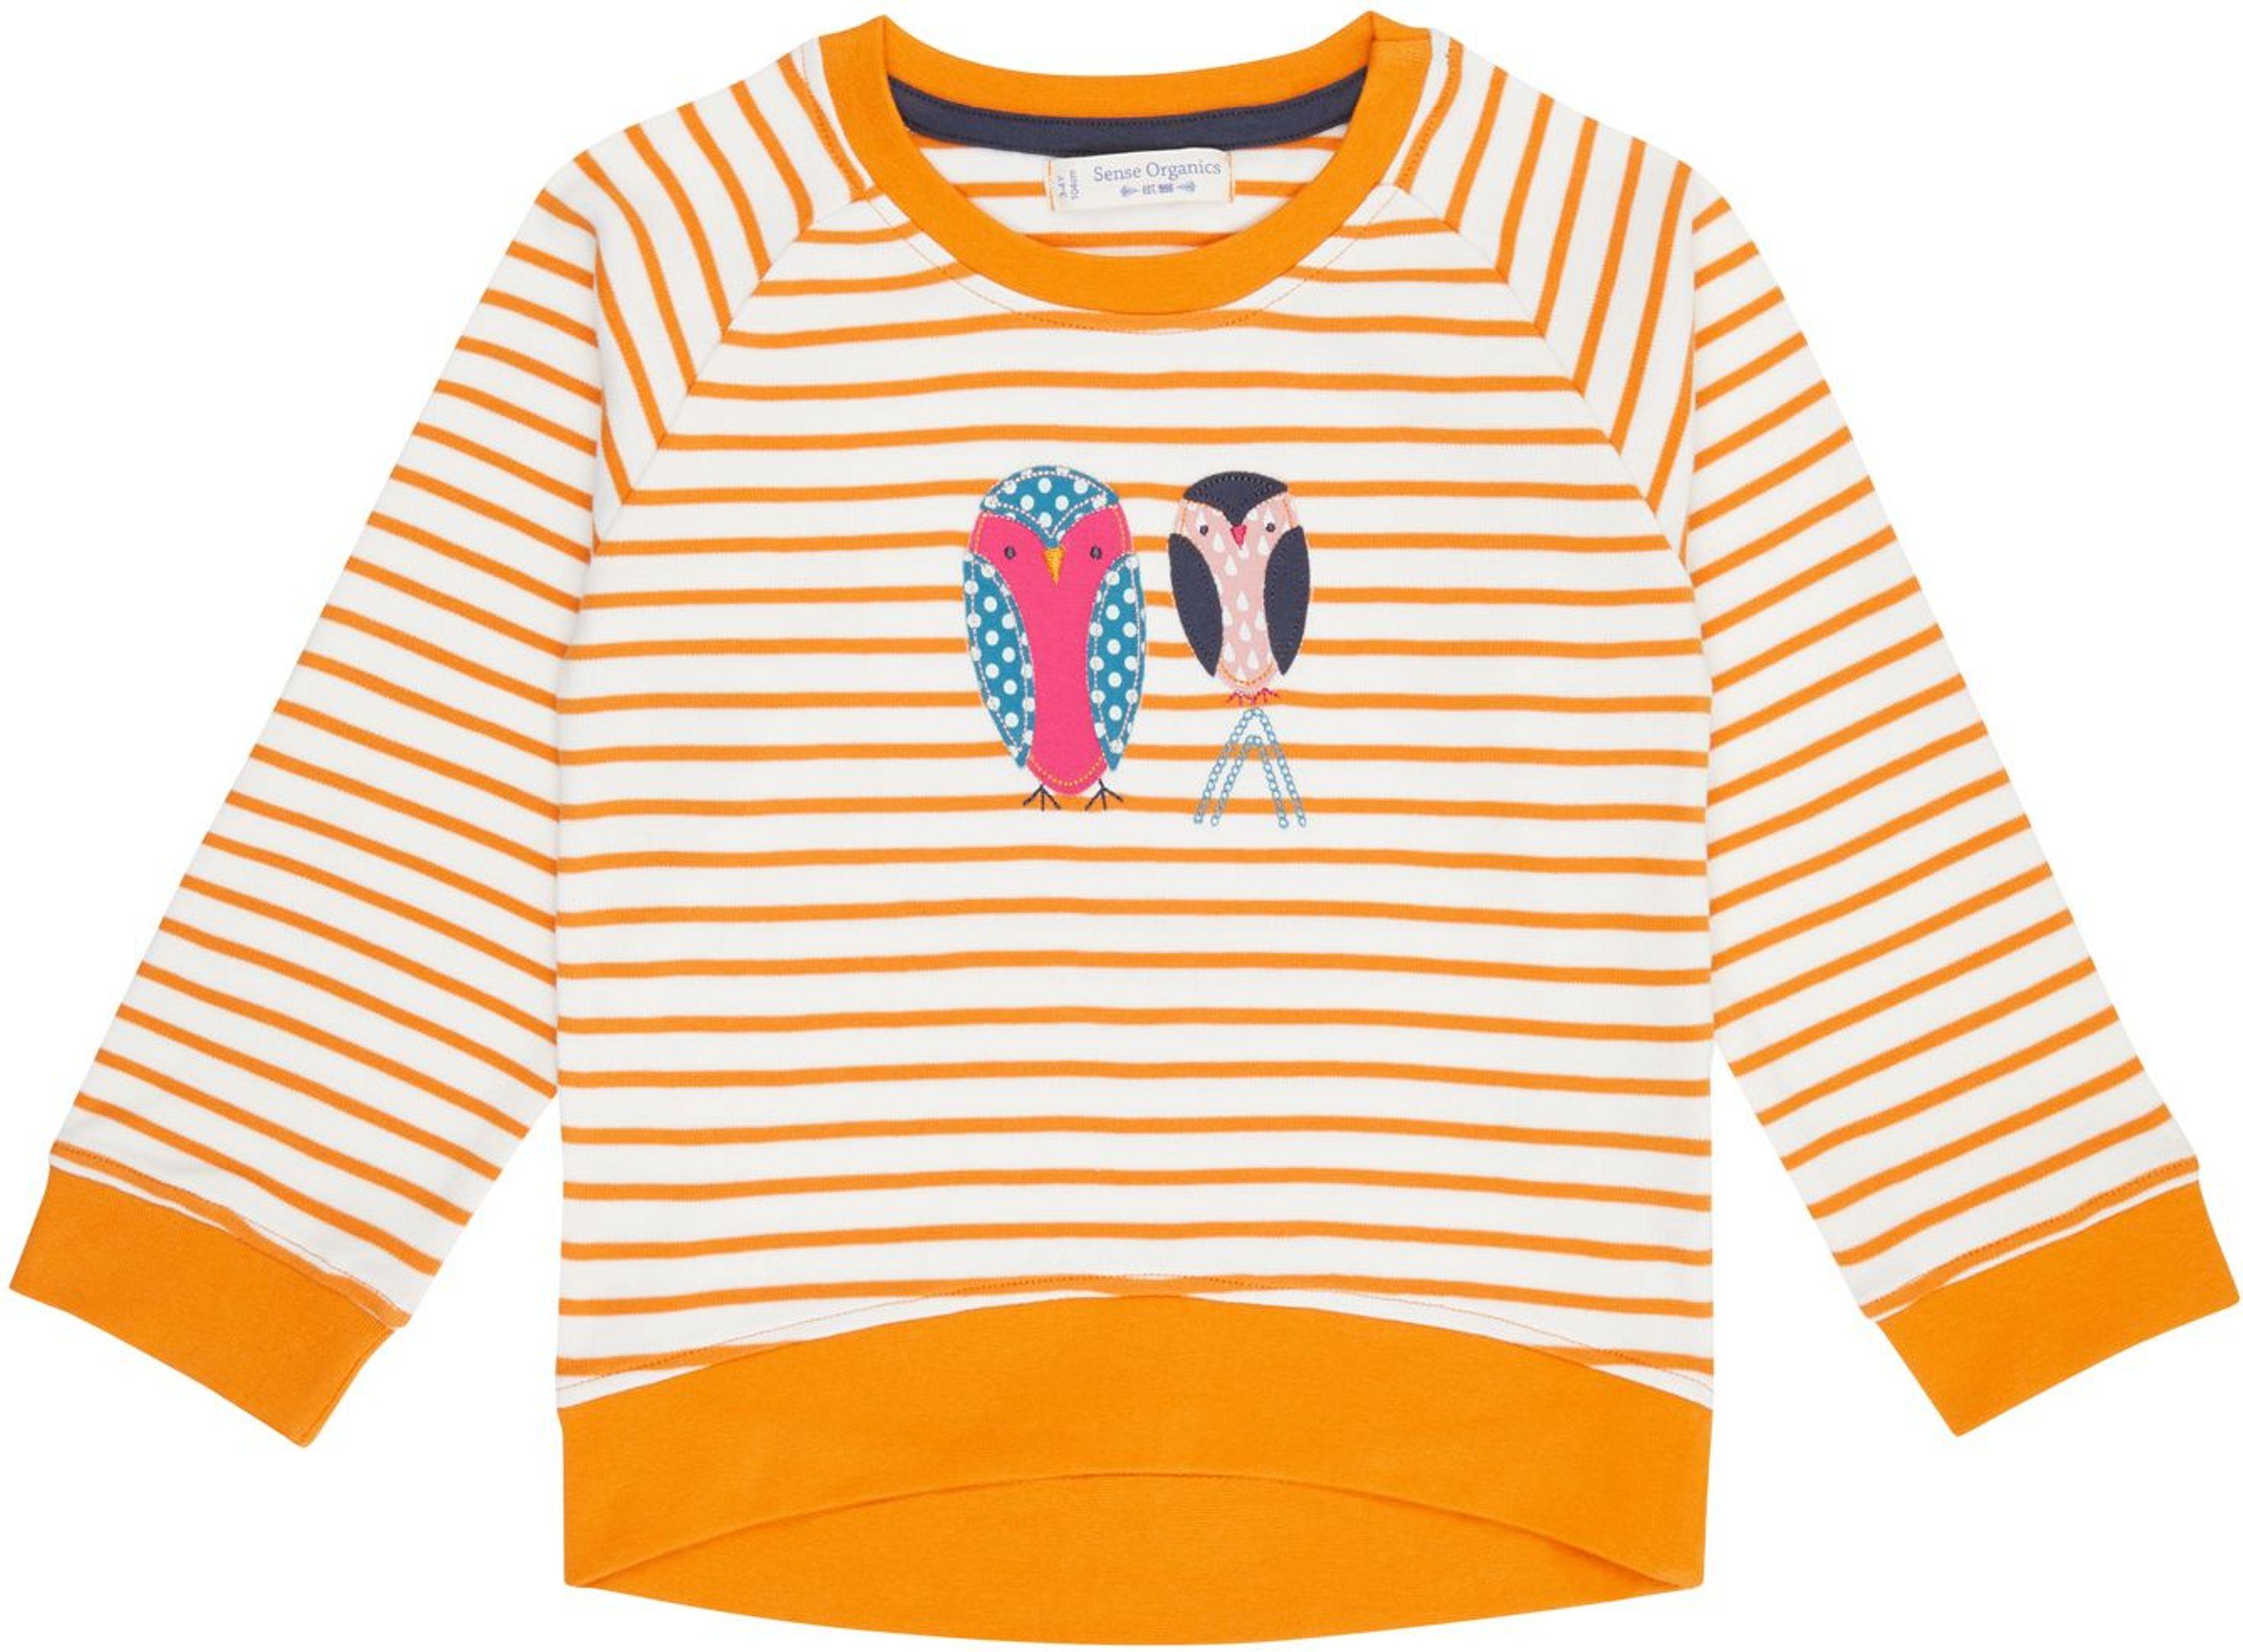 Sense Organic DENA Raglan Shirt stripes/owl